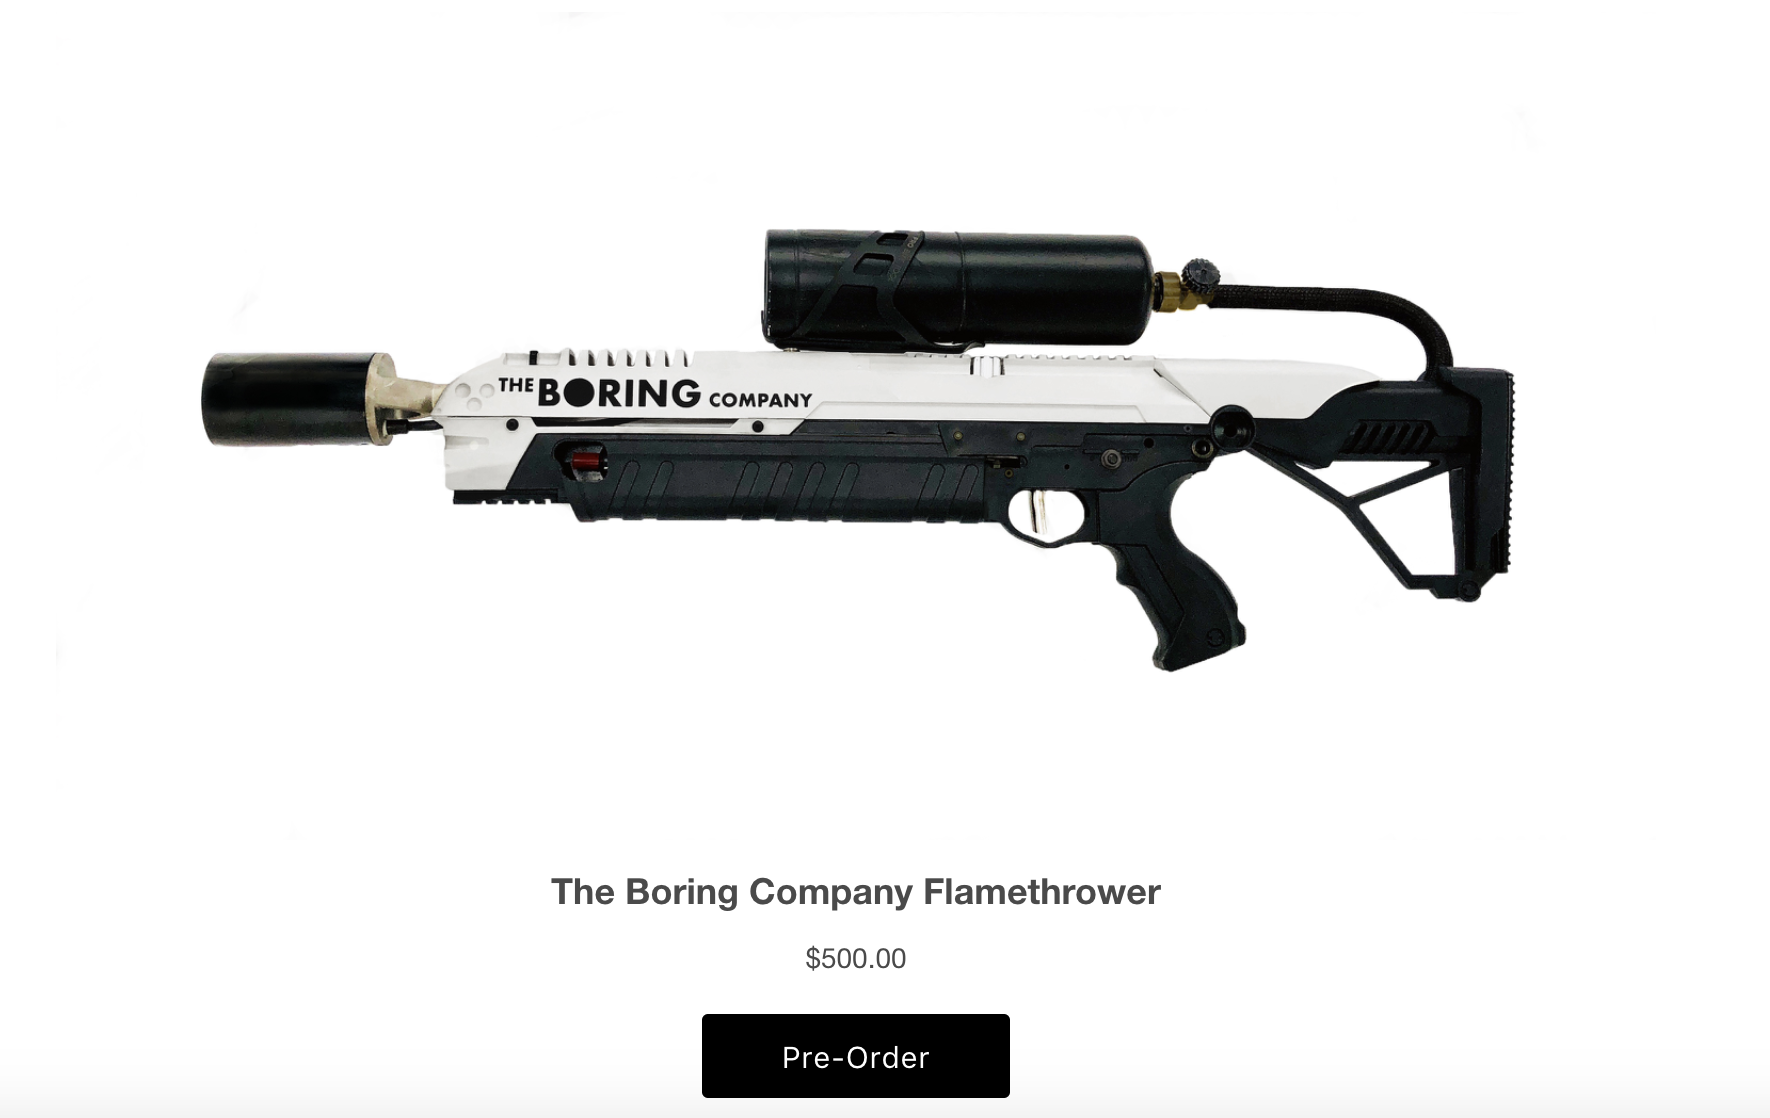 06170800ac4 Here s Elon Musk s  500 Boring Company flamethrower - The Verge